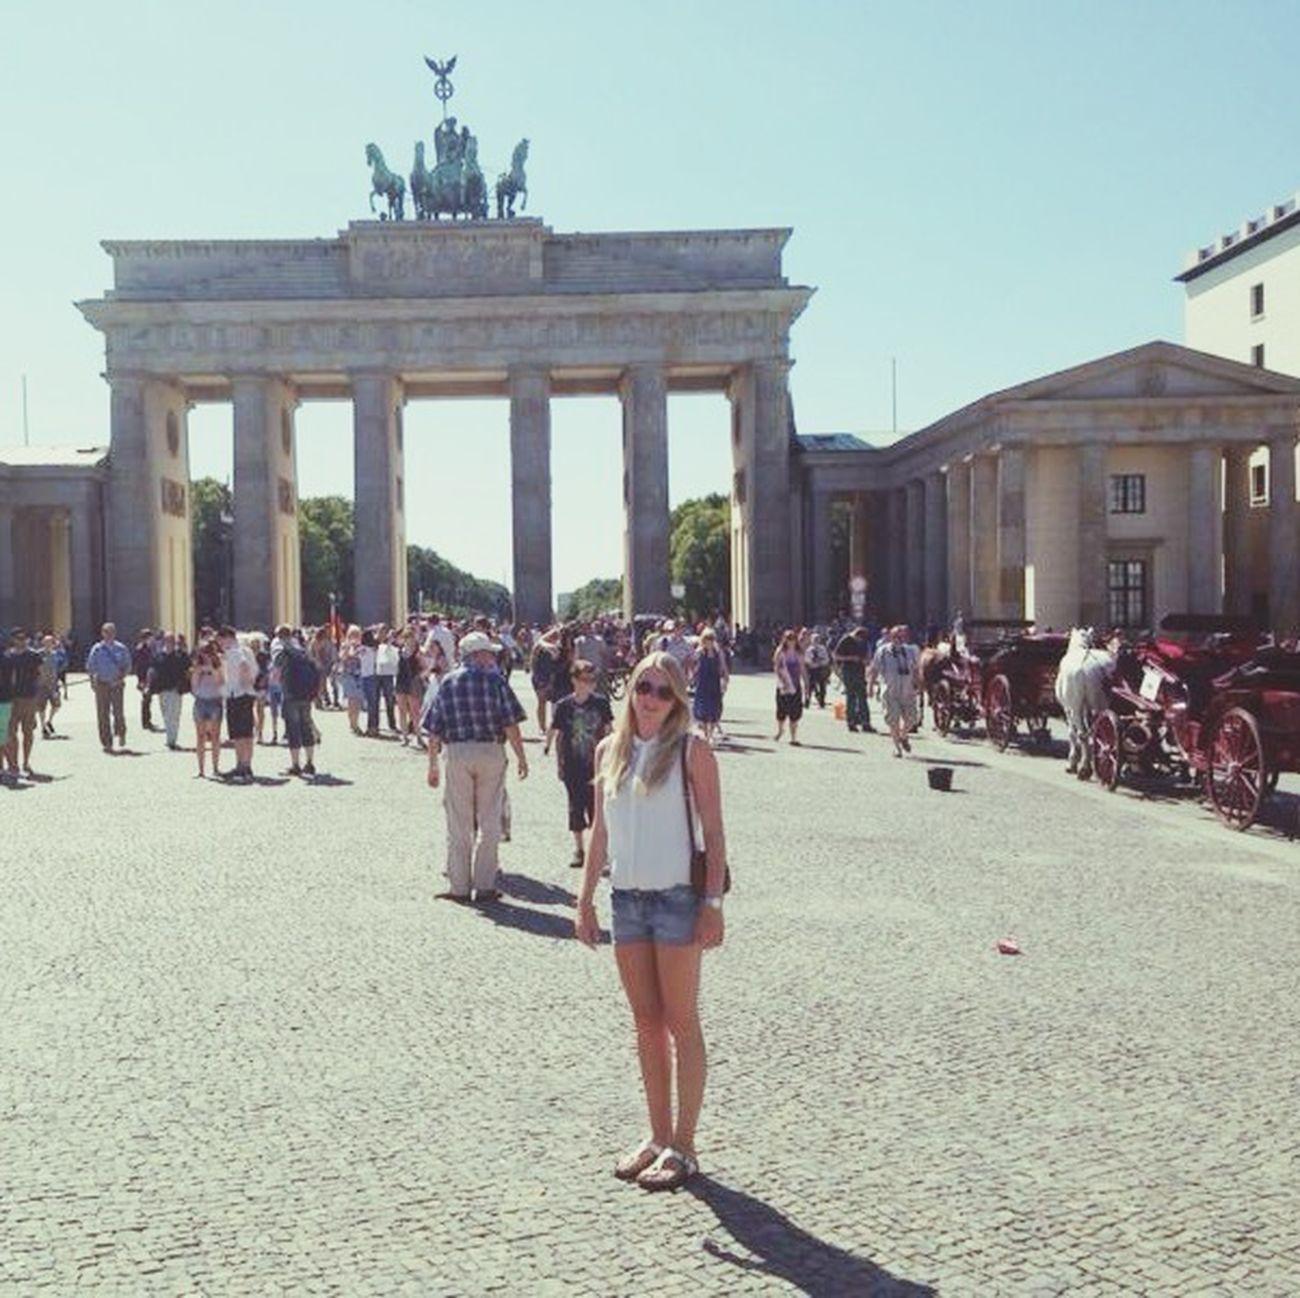 some Sightseeing at Brandenburgertor in Berlin